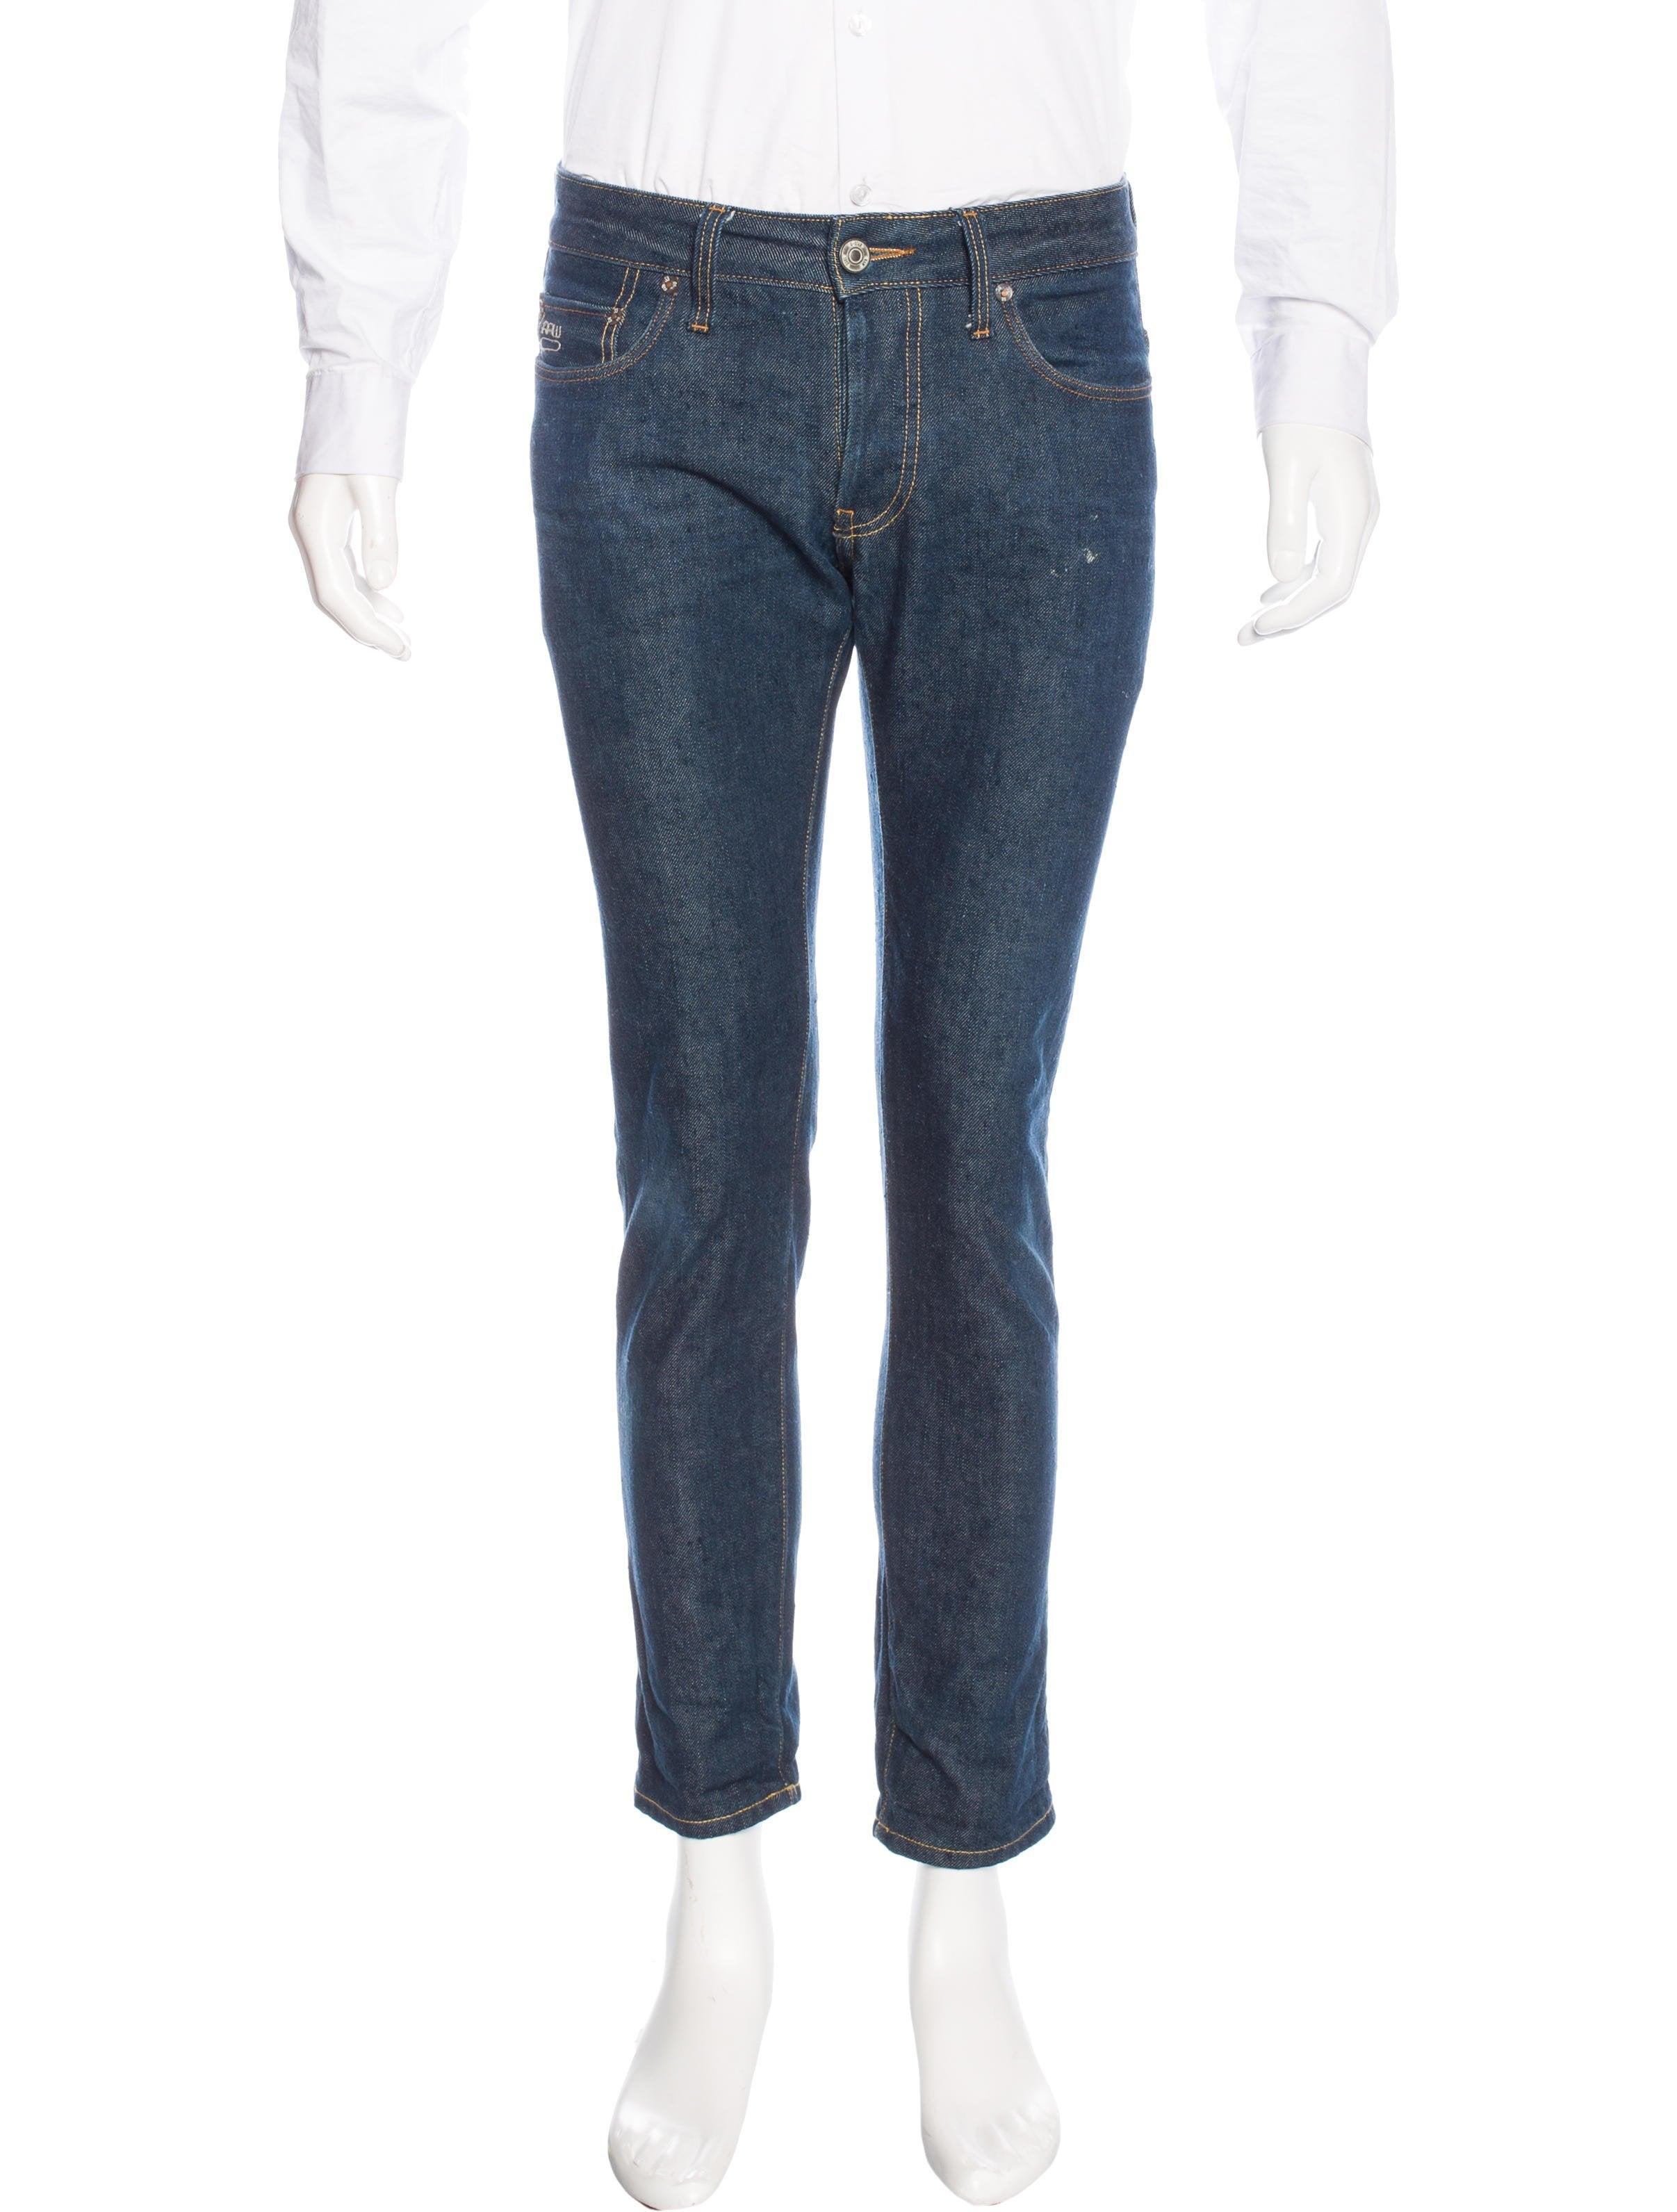 g star raw 3301 slim jeans clothing wgsrw20102 the. Black Bedroom Furniture Sets. Home Design Ideas